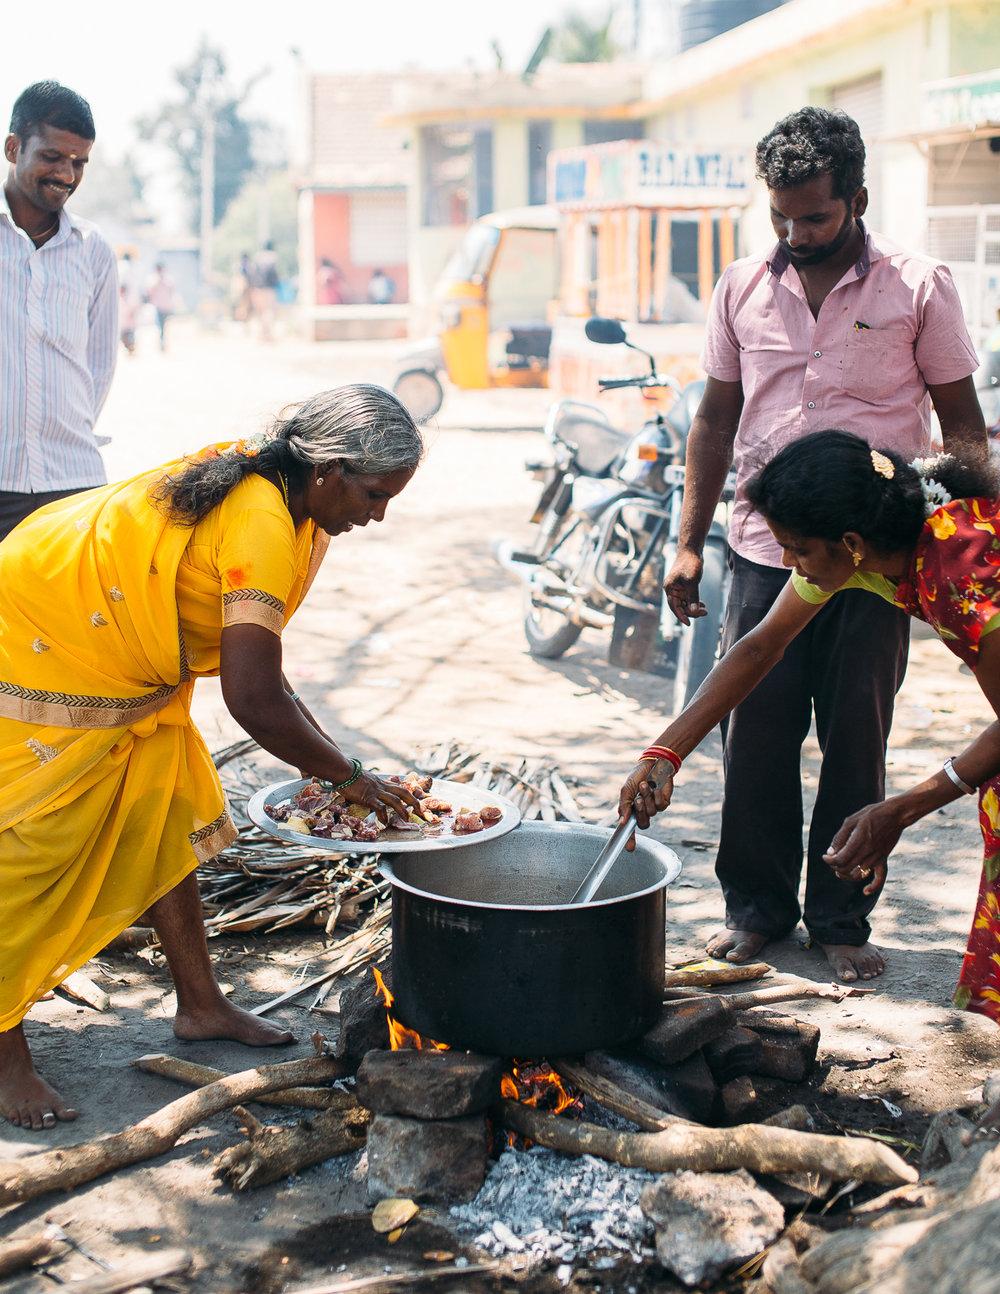 Families prepare meals in Vettuvanam, India on March 11, 2016.